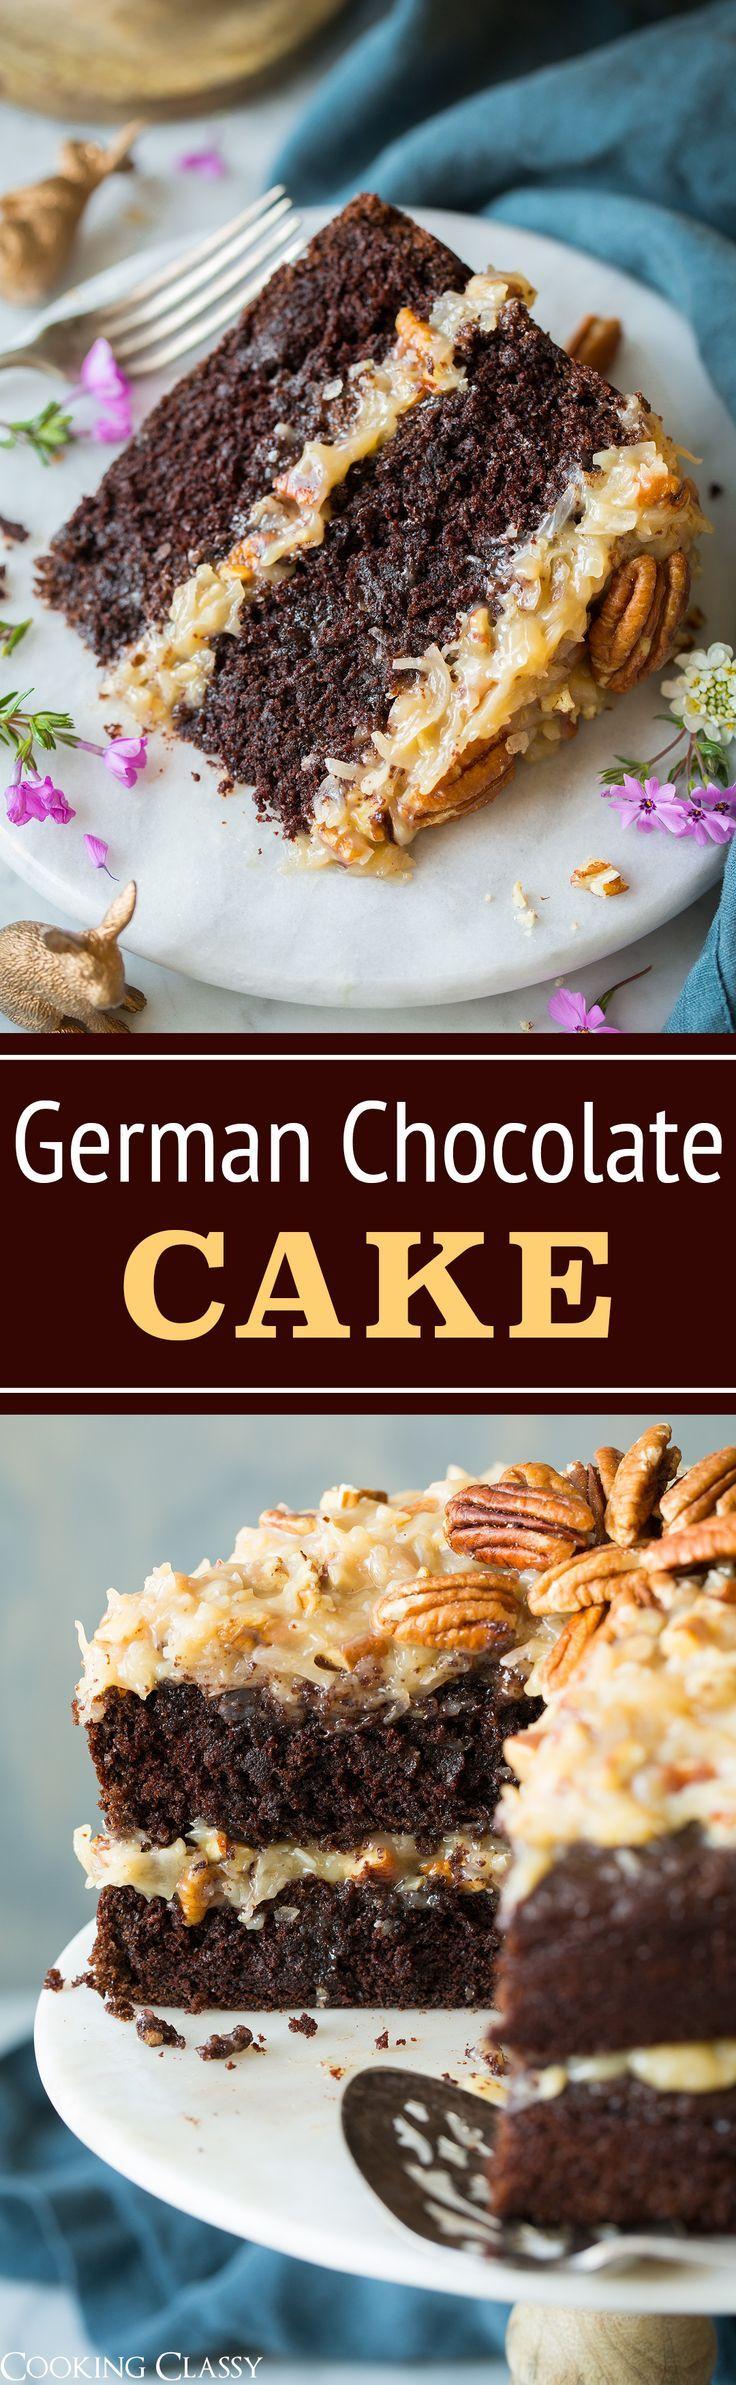 Best 25+ Homemade german chocolate cake ideas on Pinterest ...